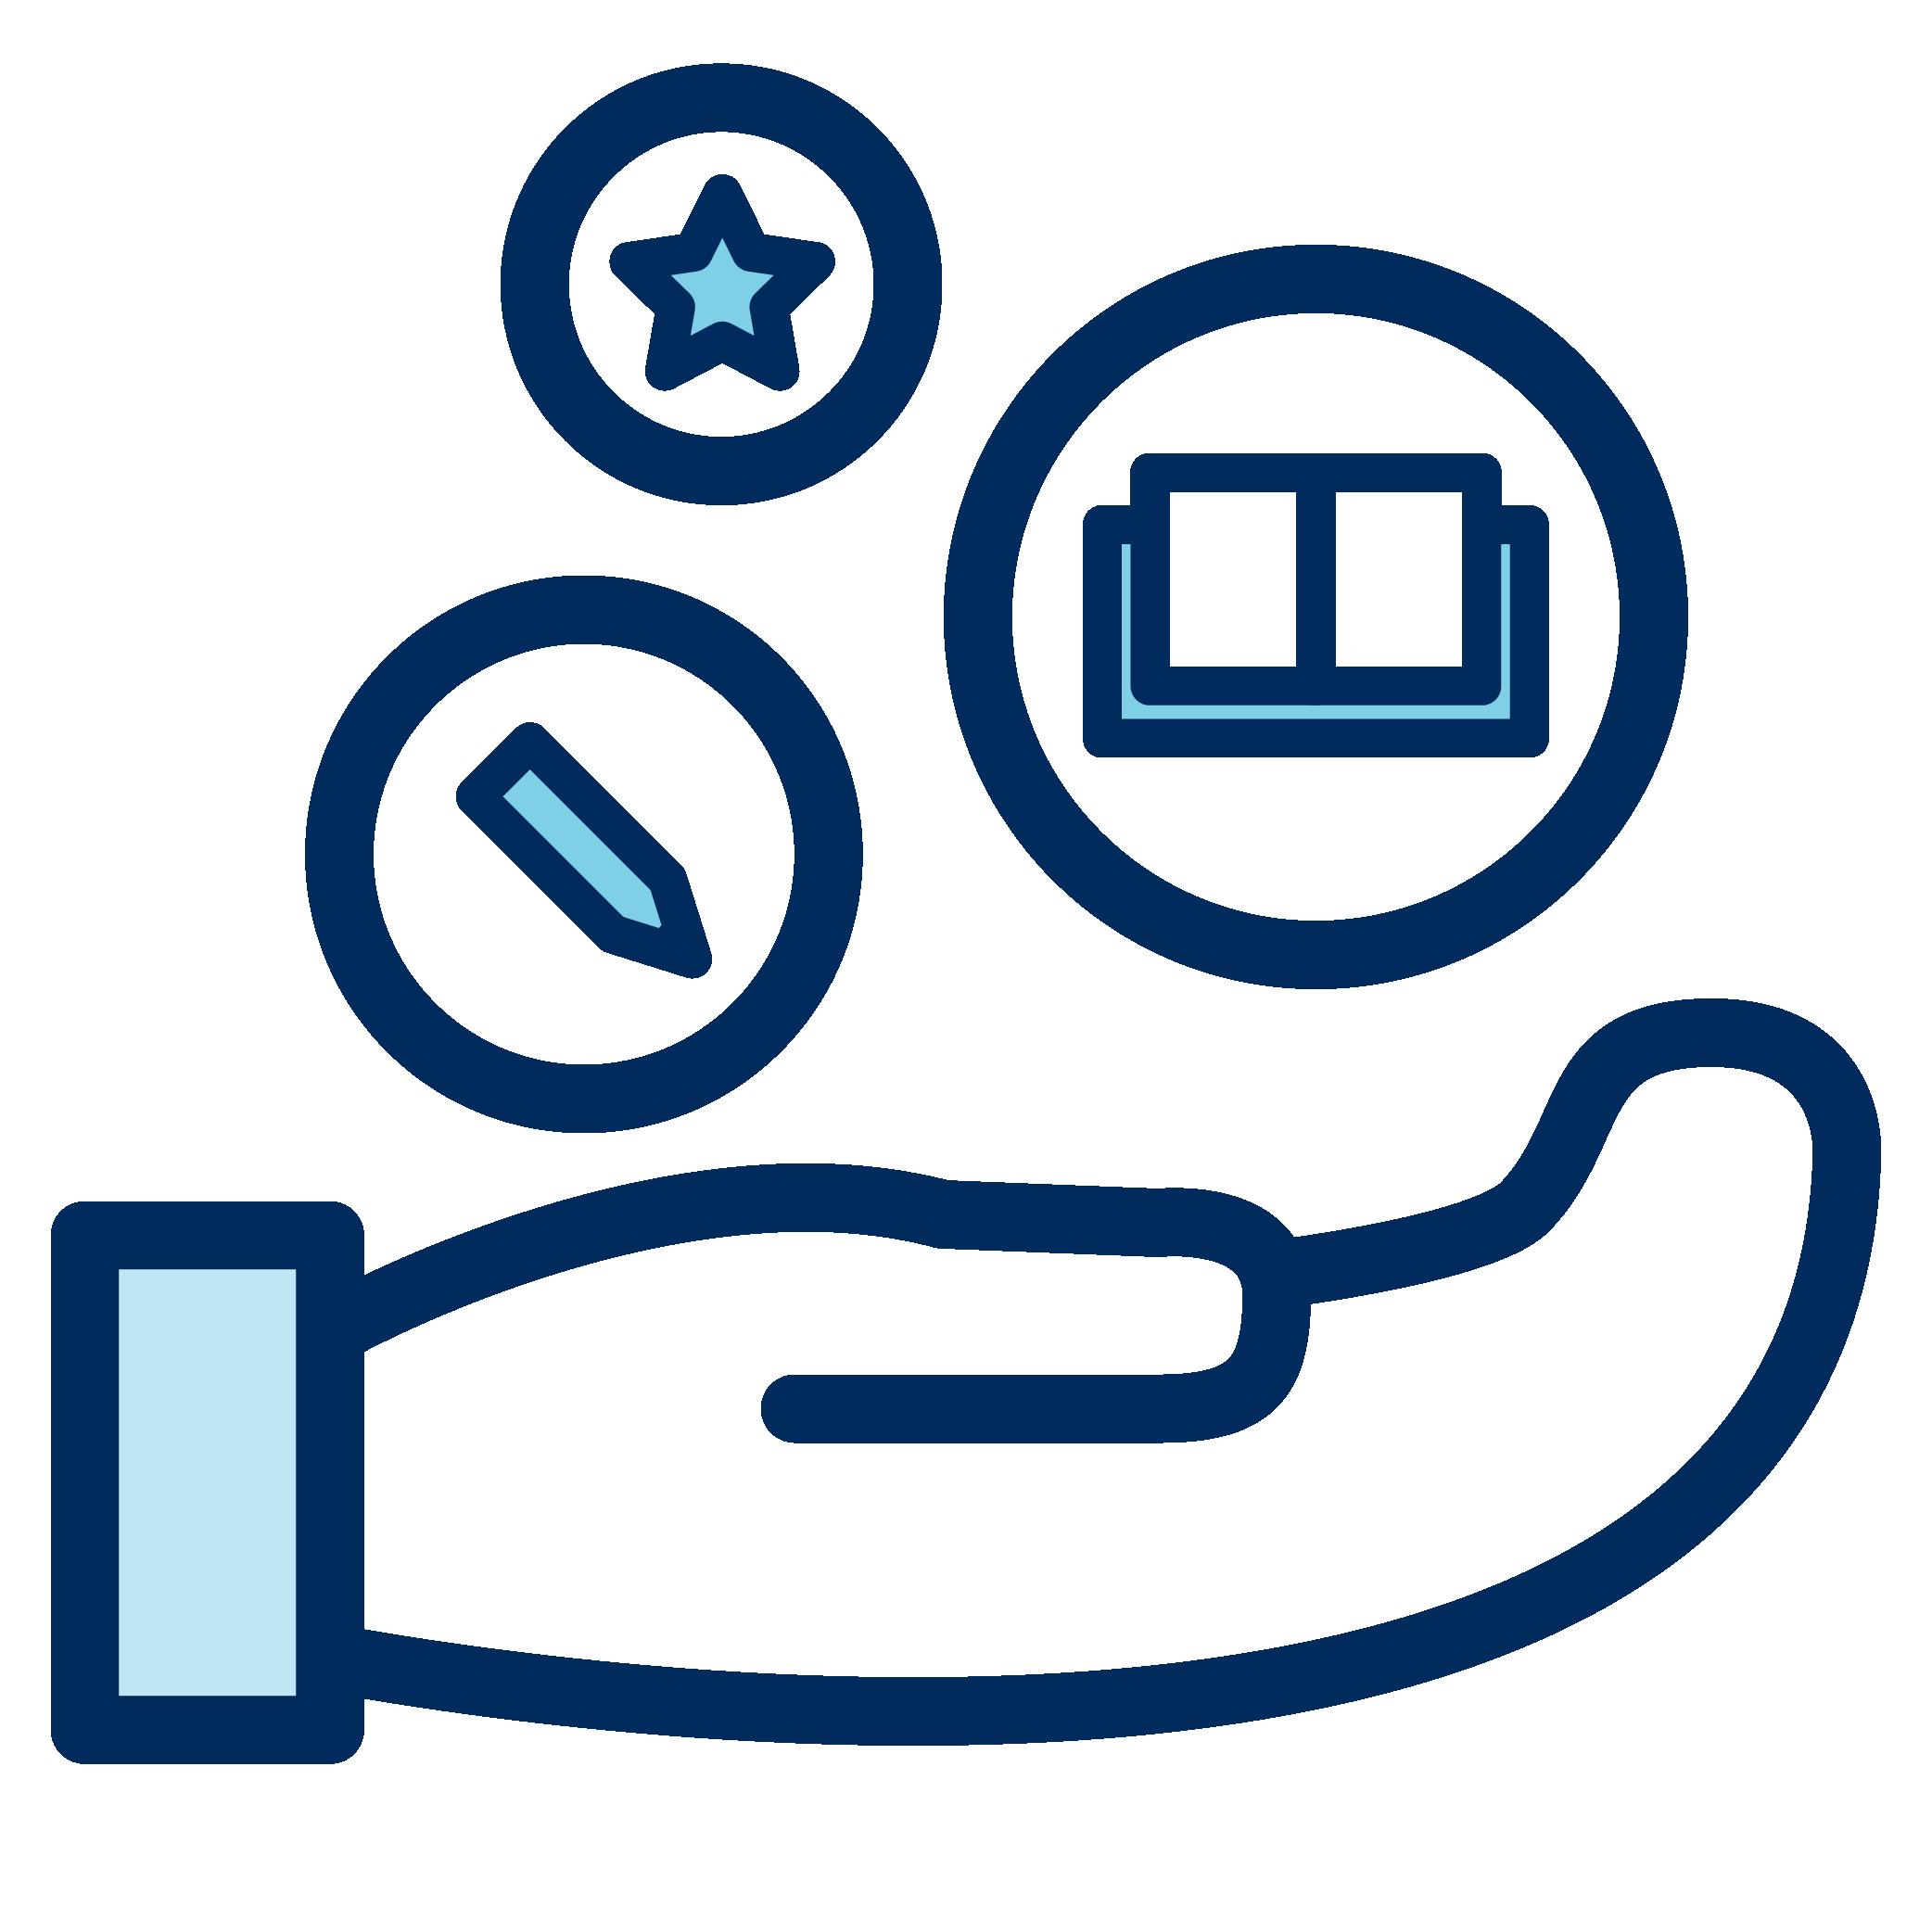 Resource exchange logo. Hand holding resources.